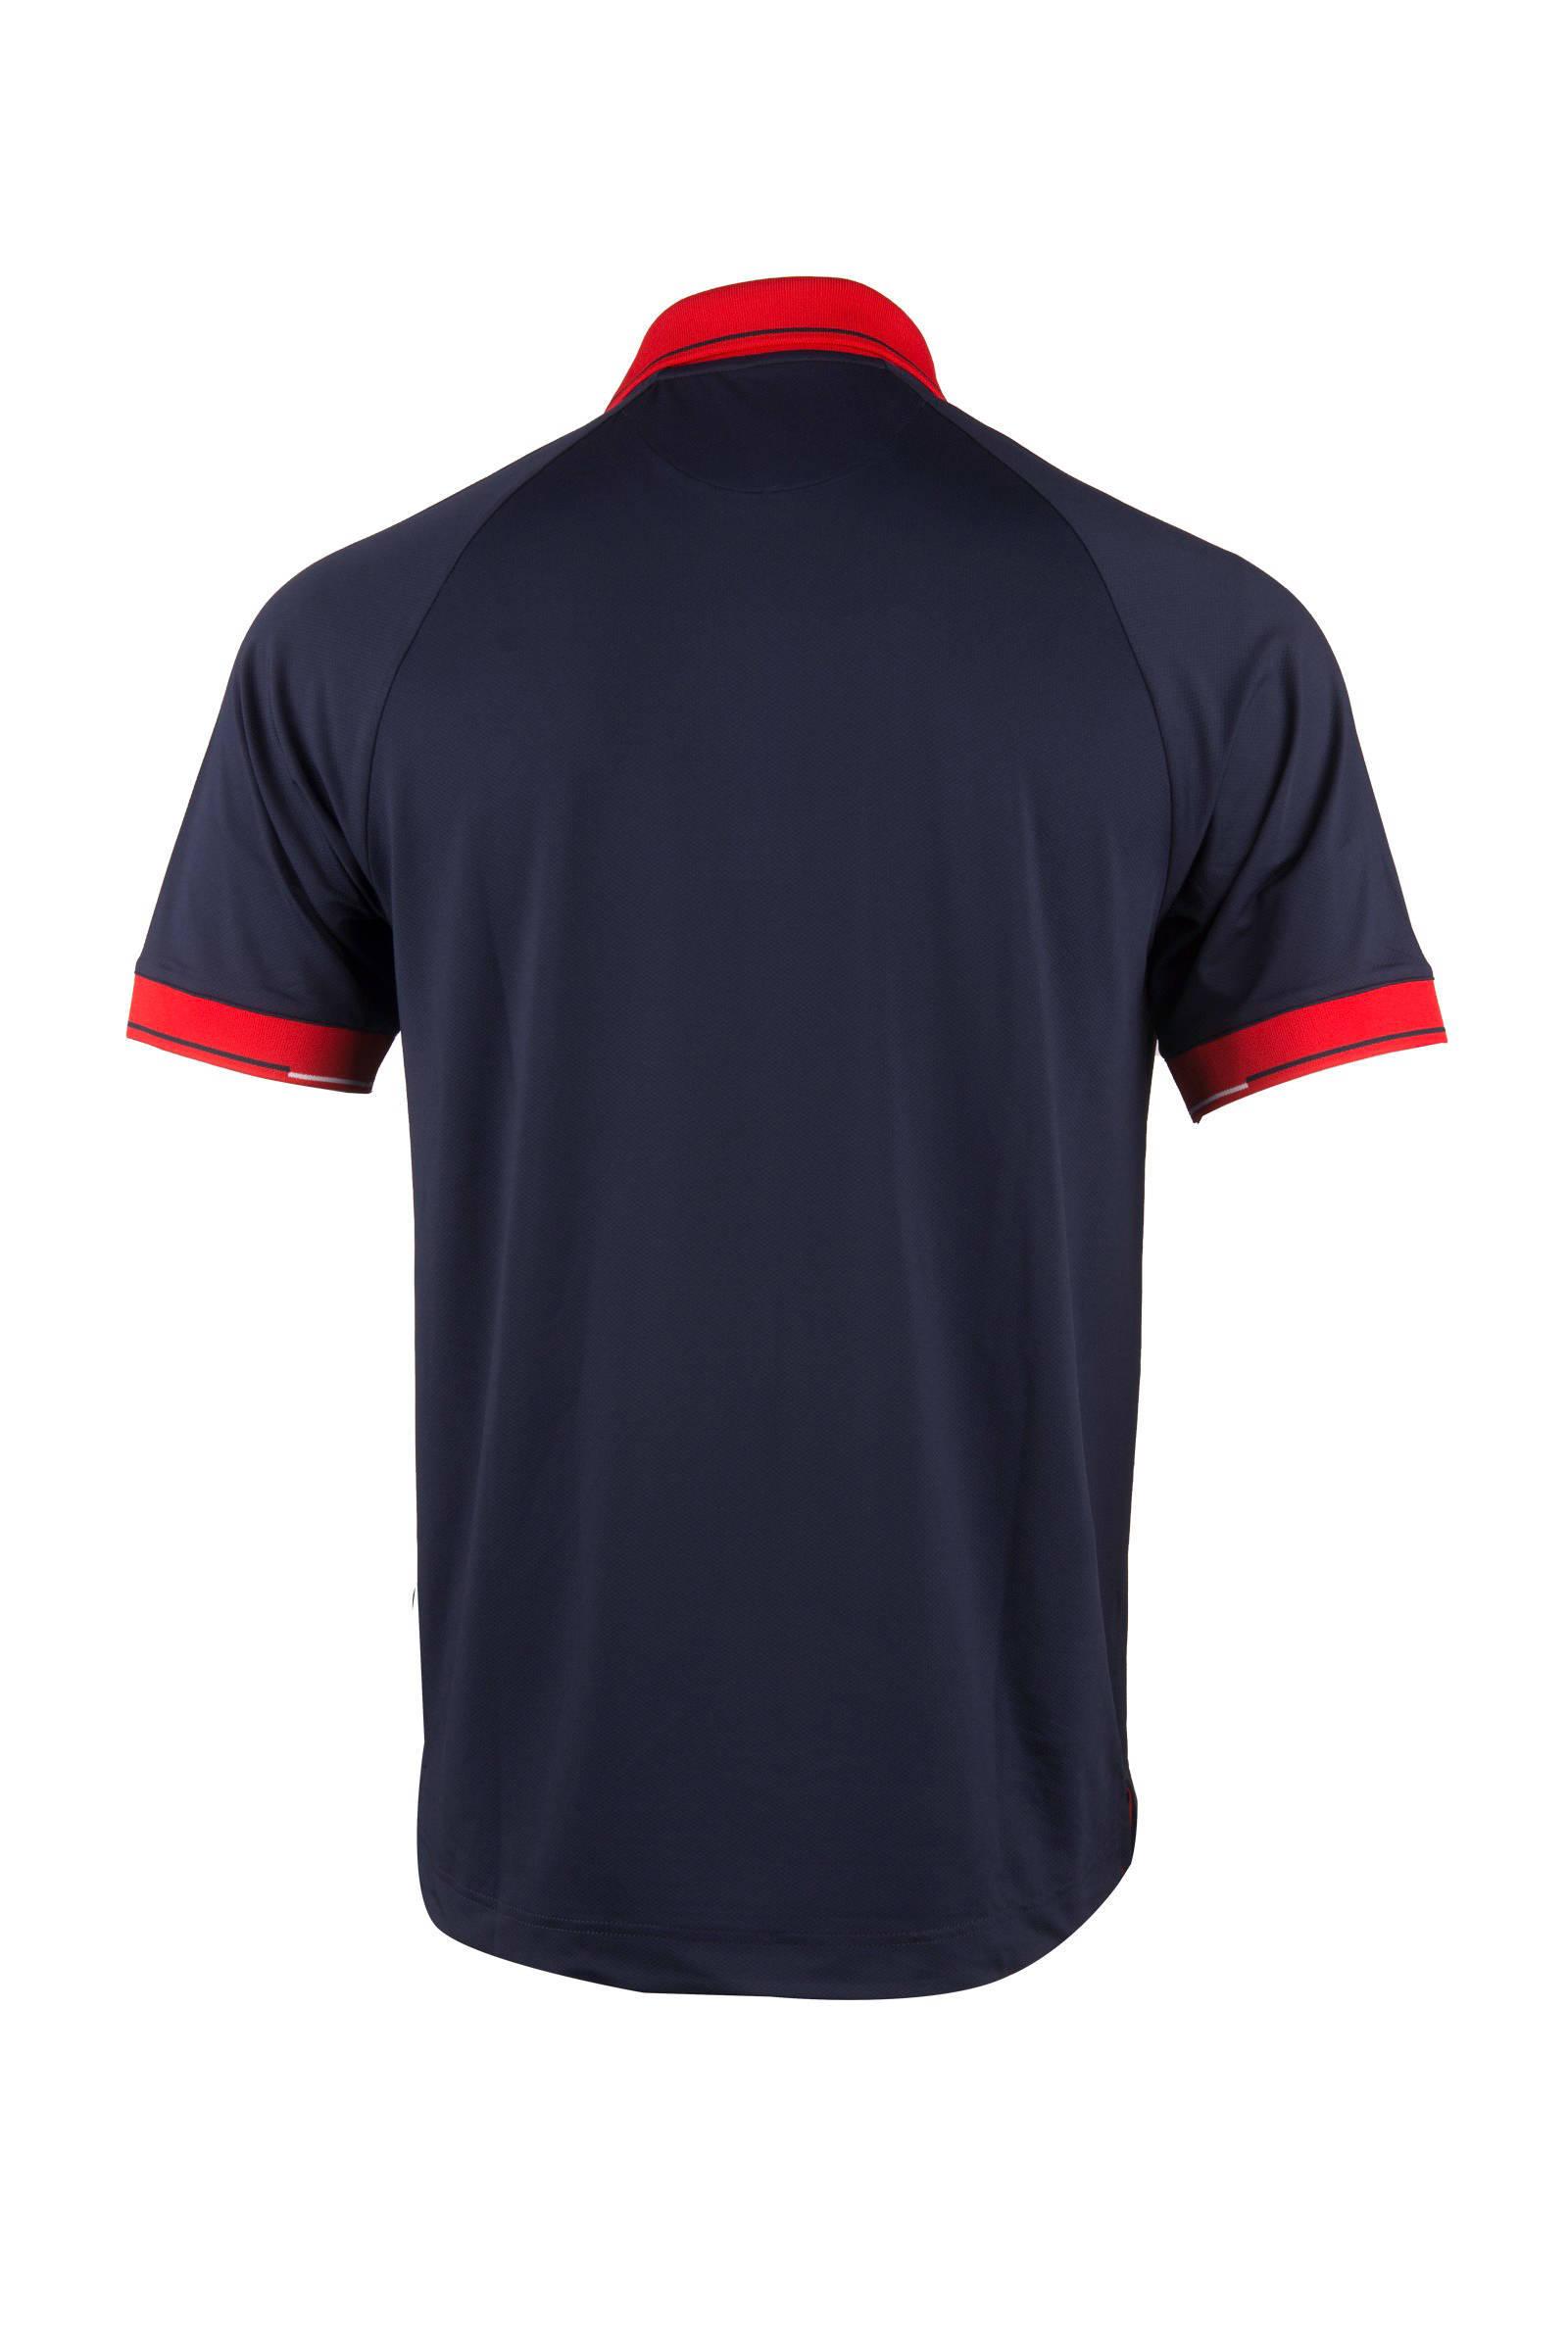 Swiss K sportpolo sportpolo K donkerblauw rood Swiss donkerblauw qBBwIPrTF